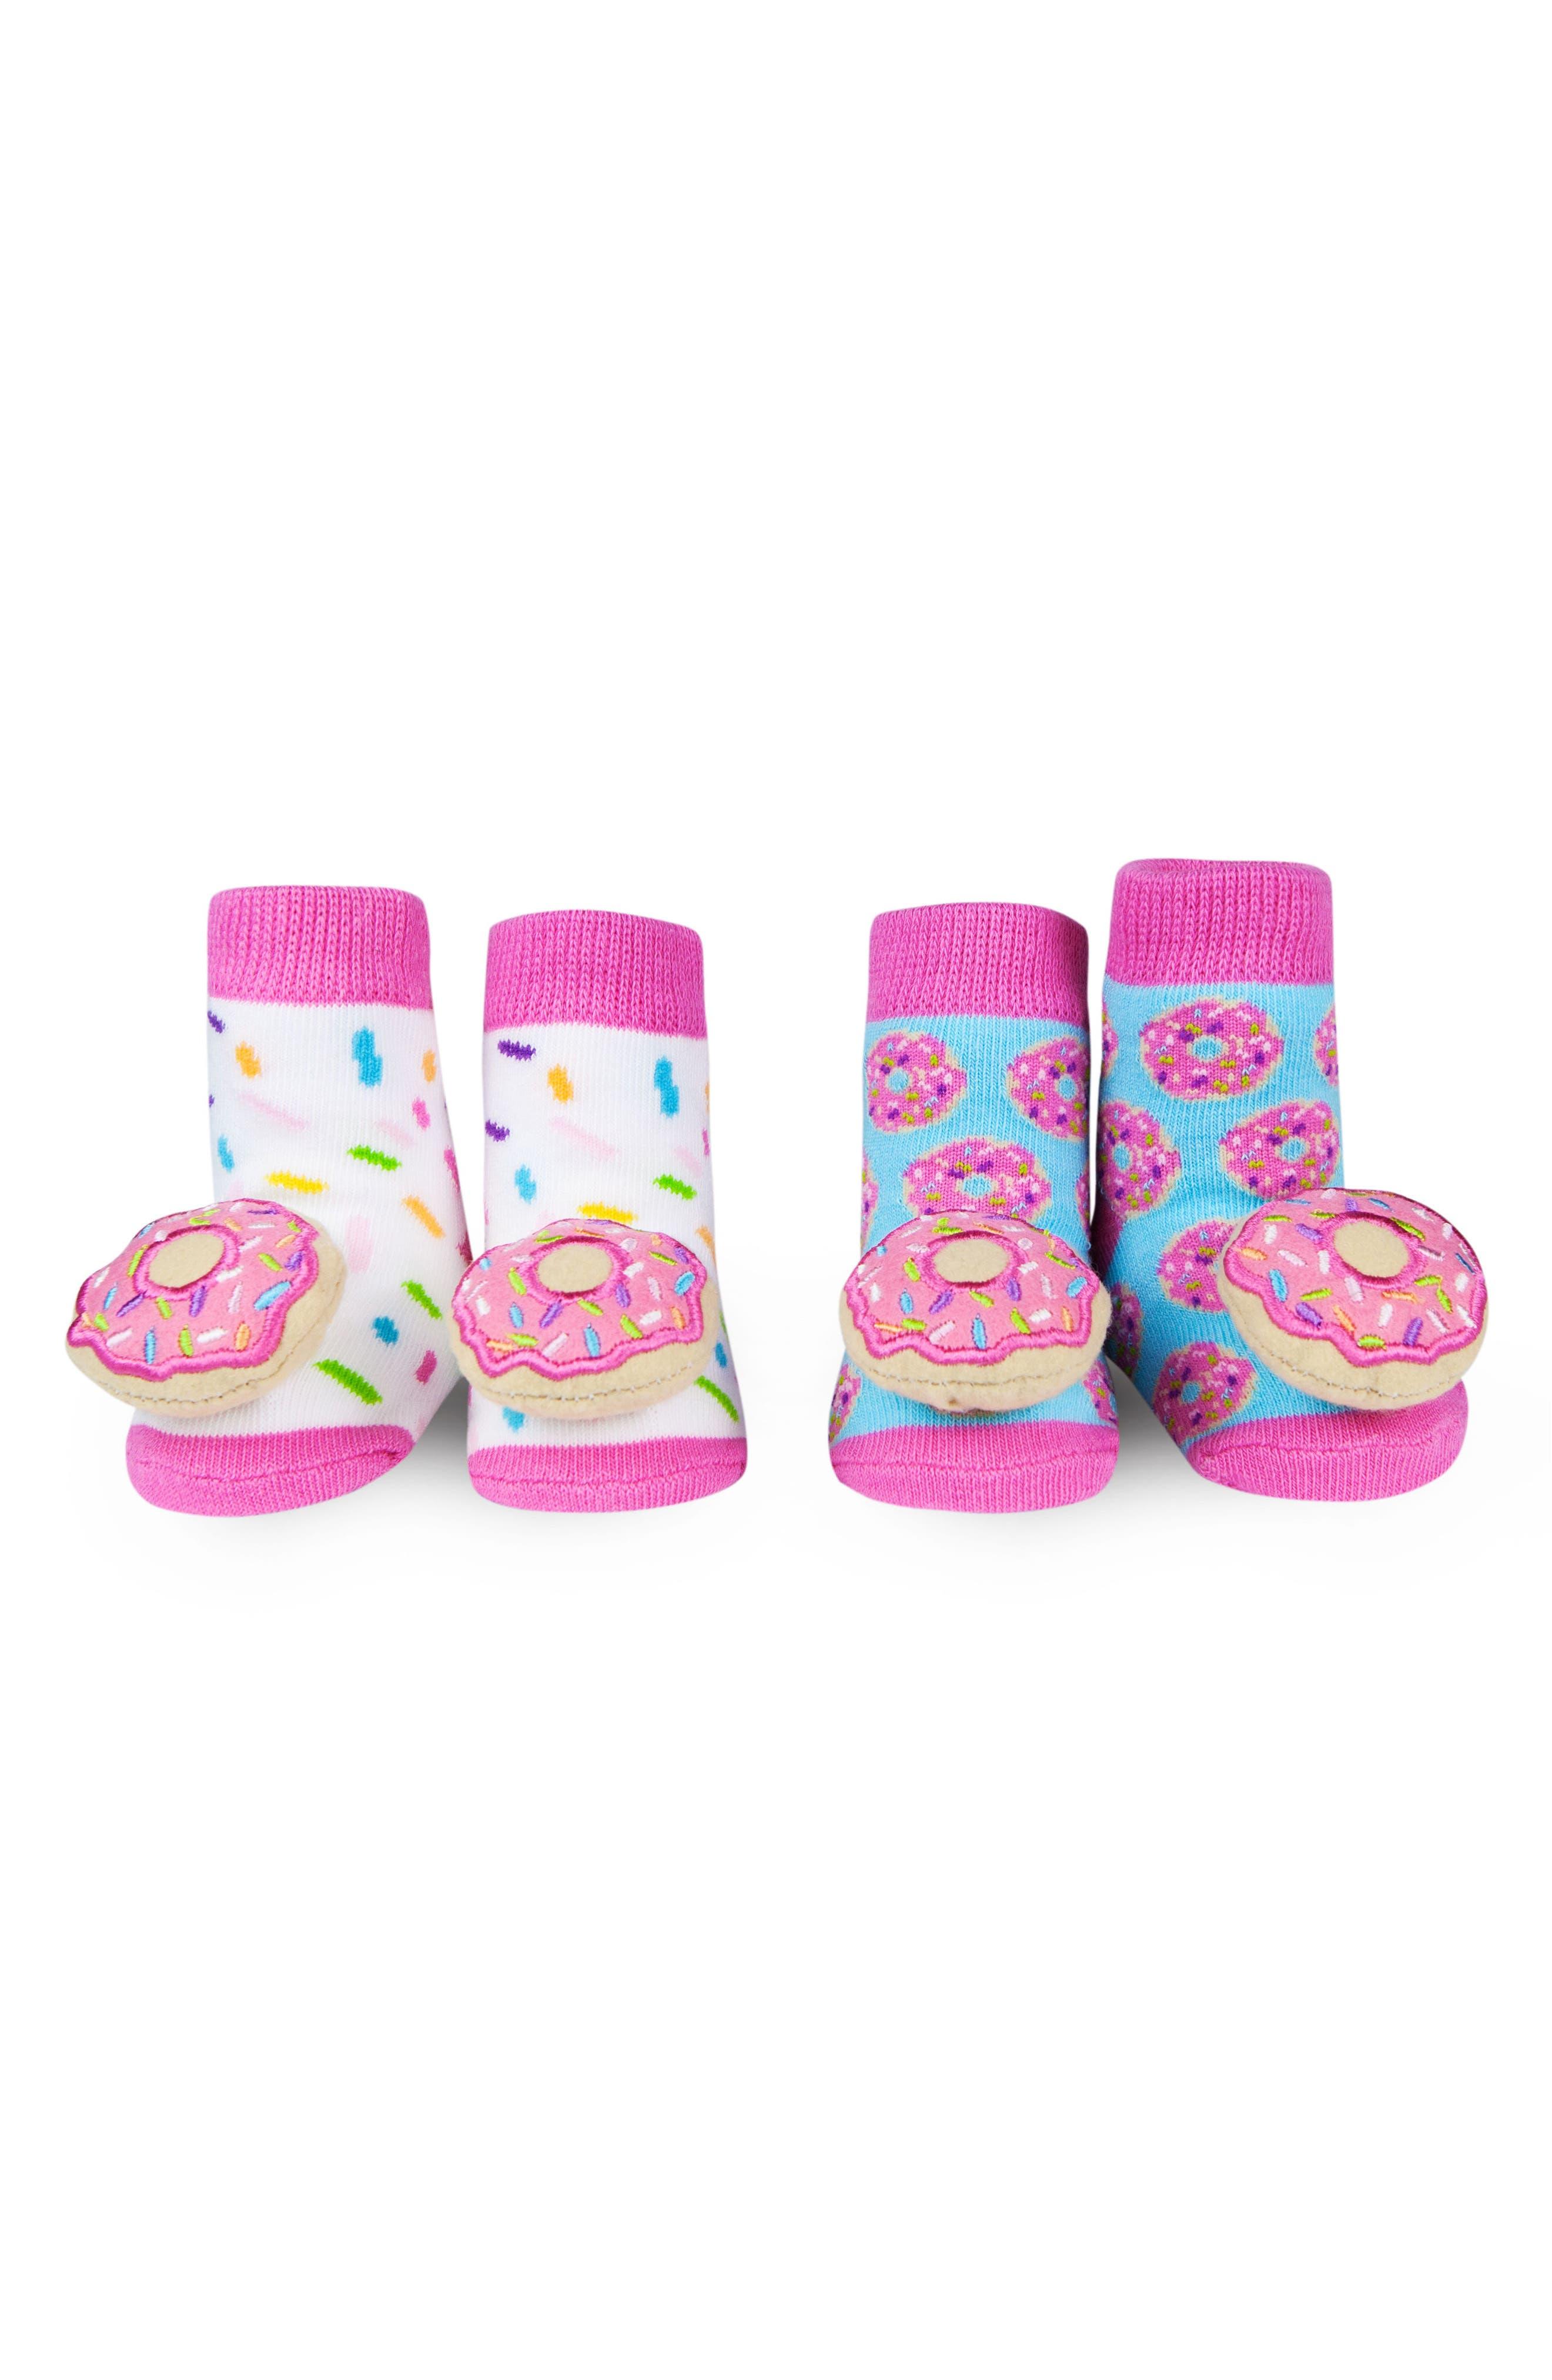 2-Pack Donut Rattle Socks,                             Main thumbnail 1, color,                             650